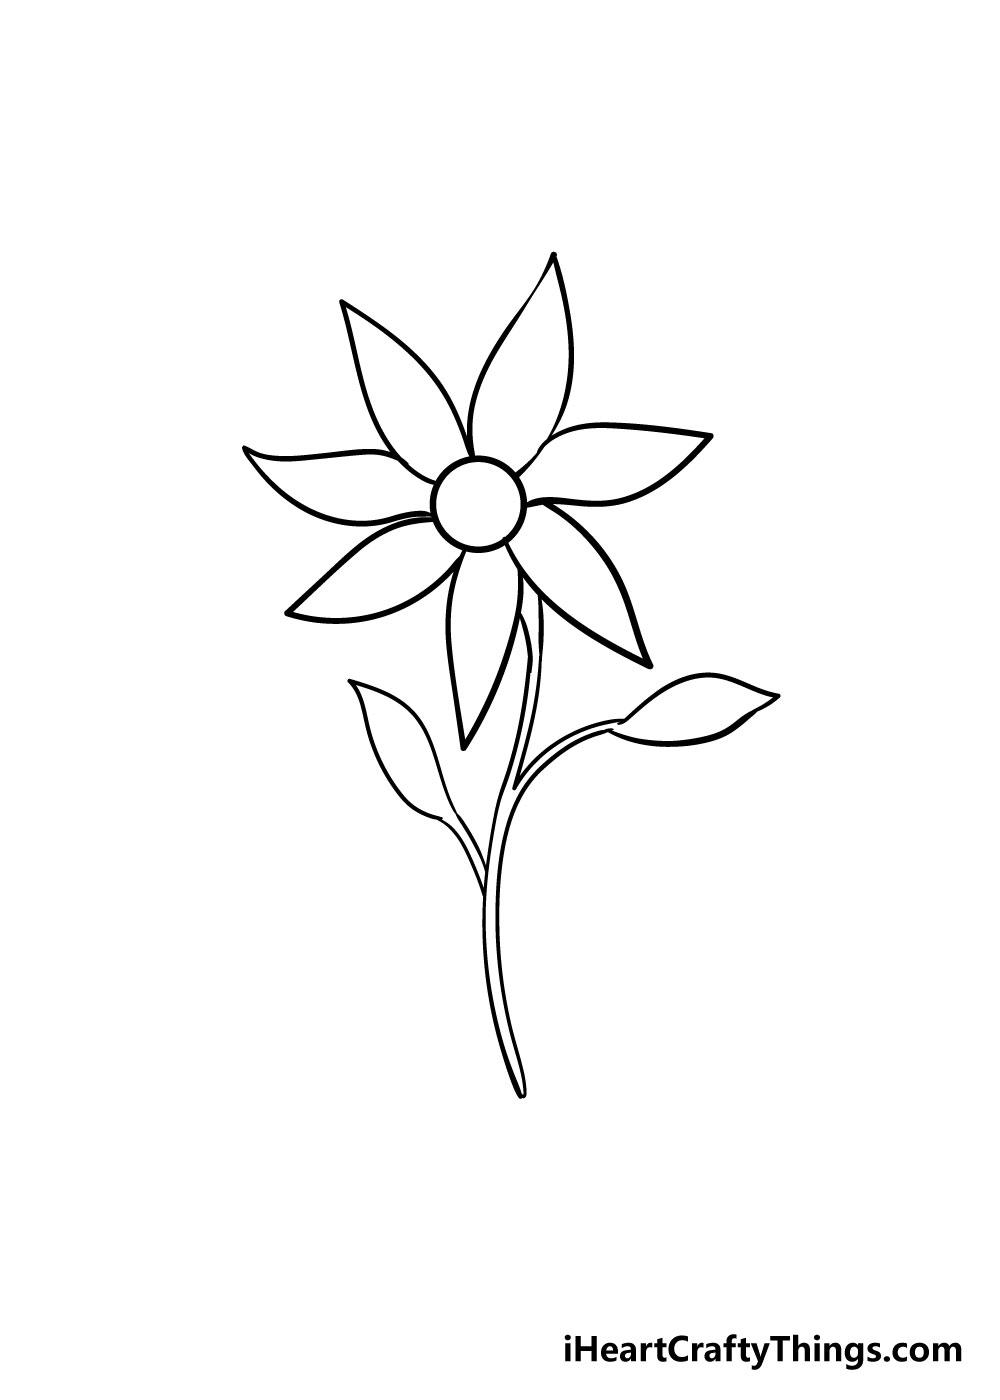 flower drawing step 7